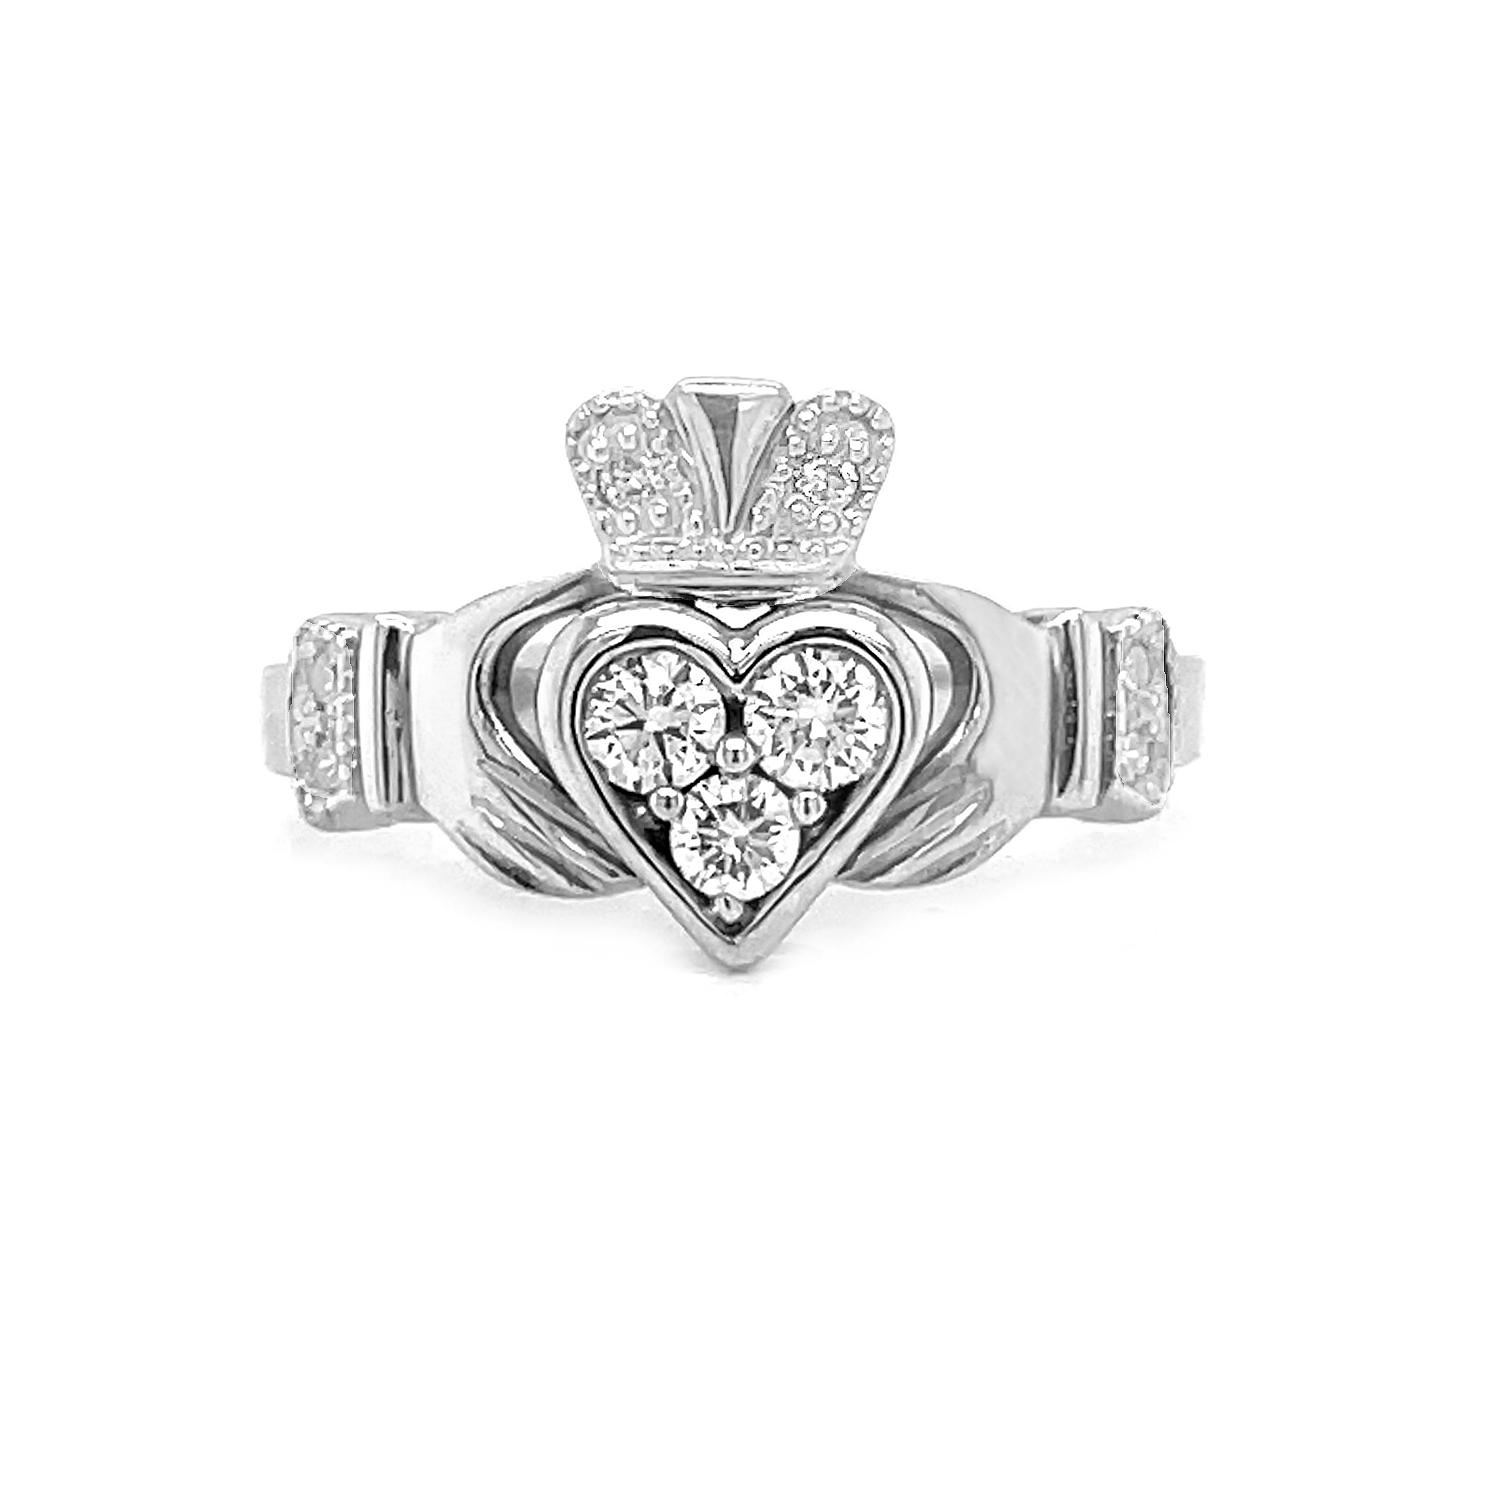 White Gold 3 Stone Diamond Claddagh Ring